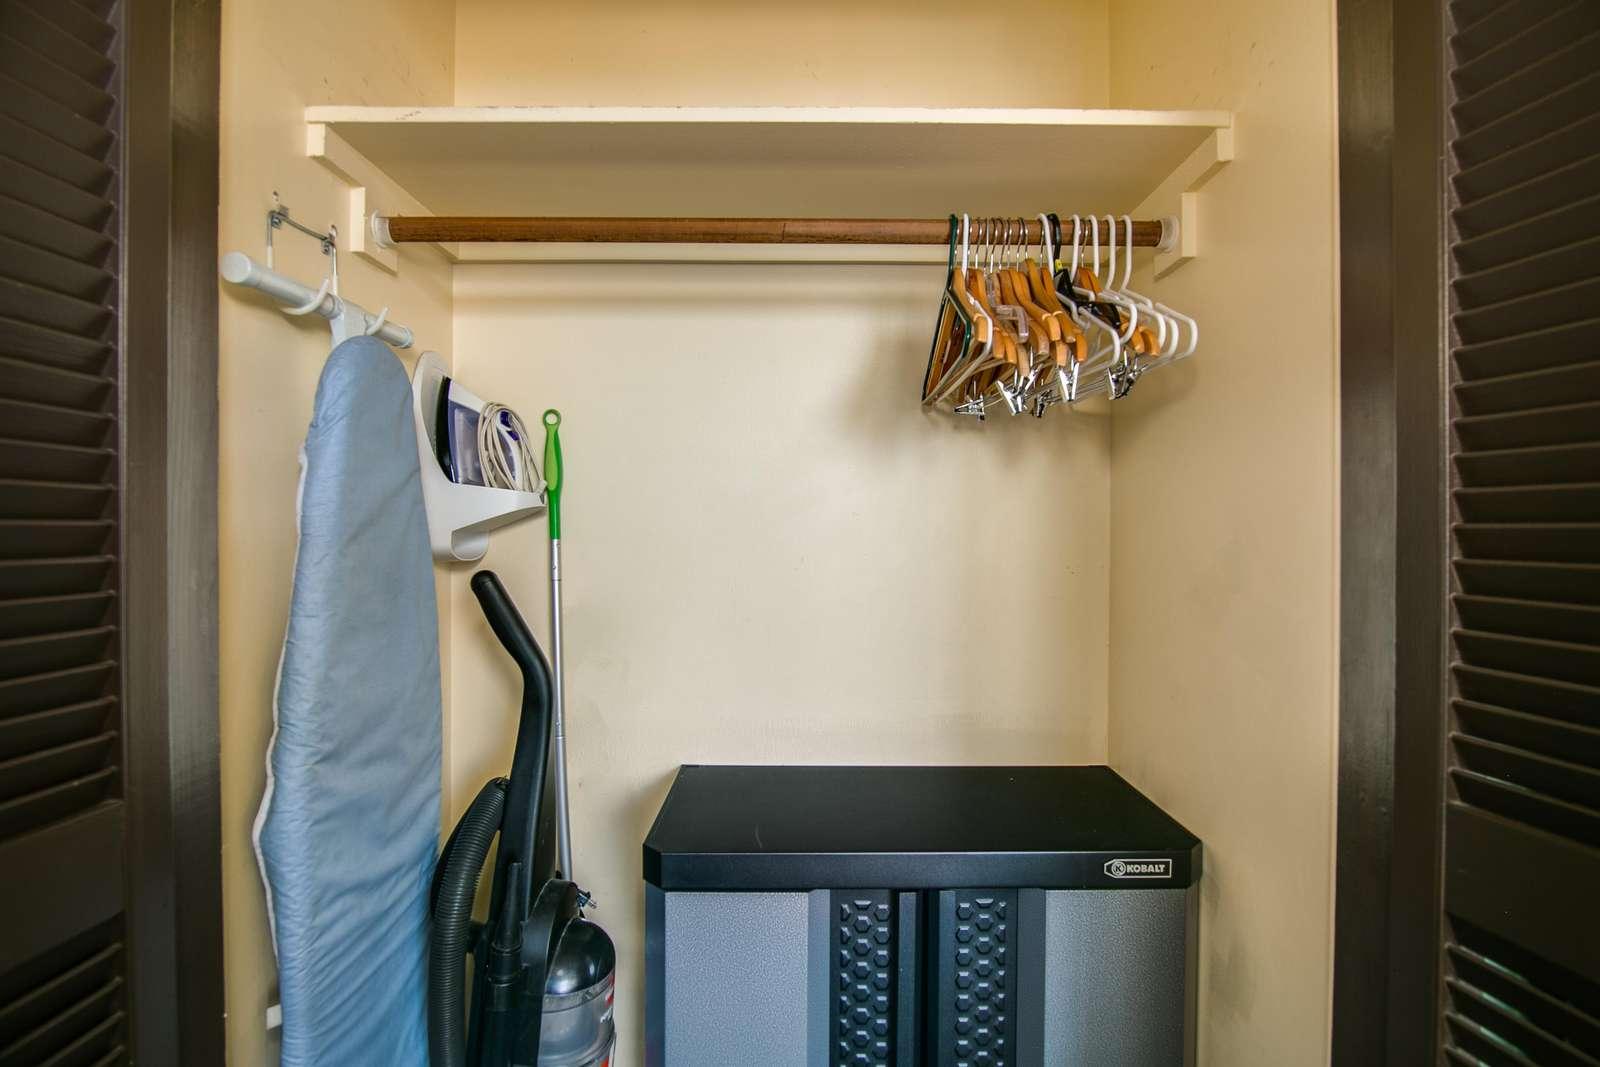 Additional storage, Iron & ironing board.